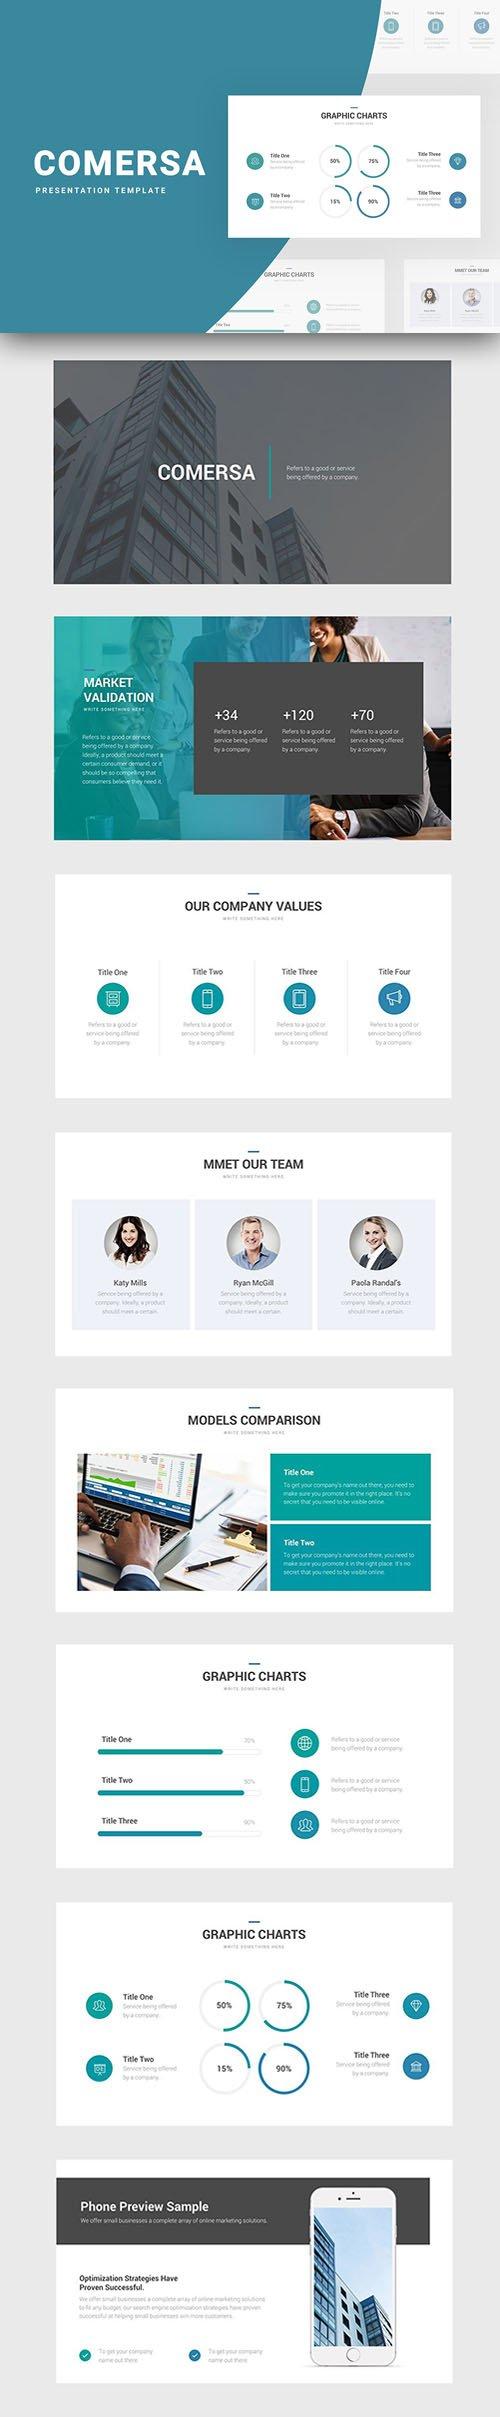 Comersa Presentation [ PPTX / KEY / Google Slides ] Templates